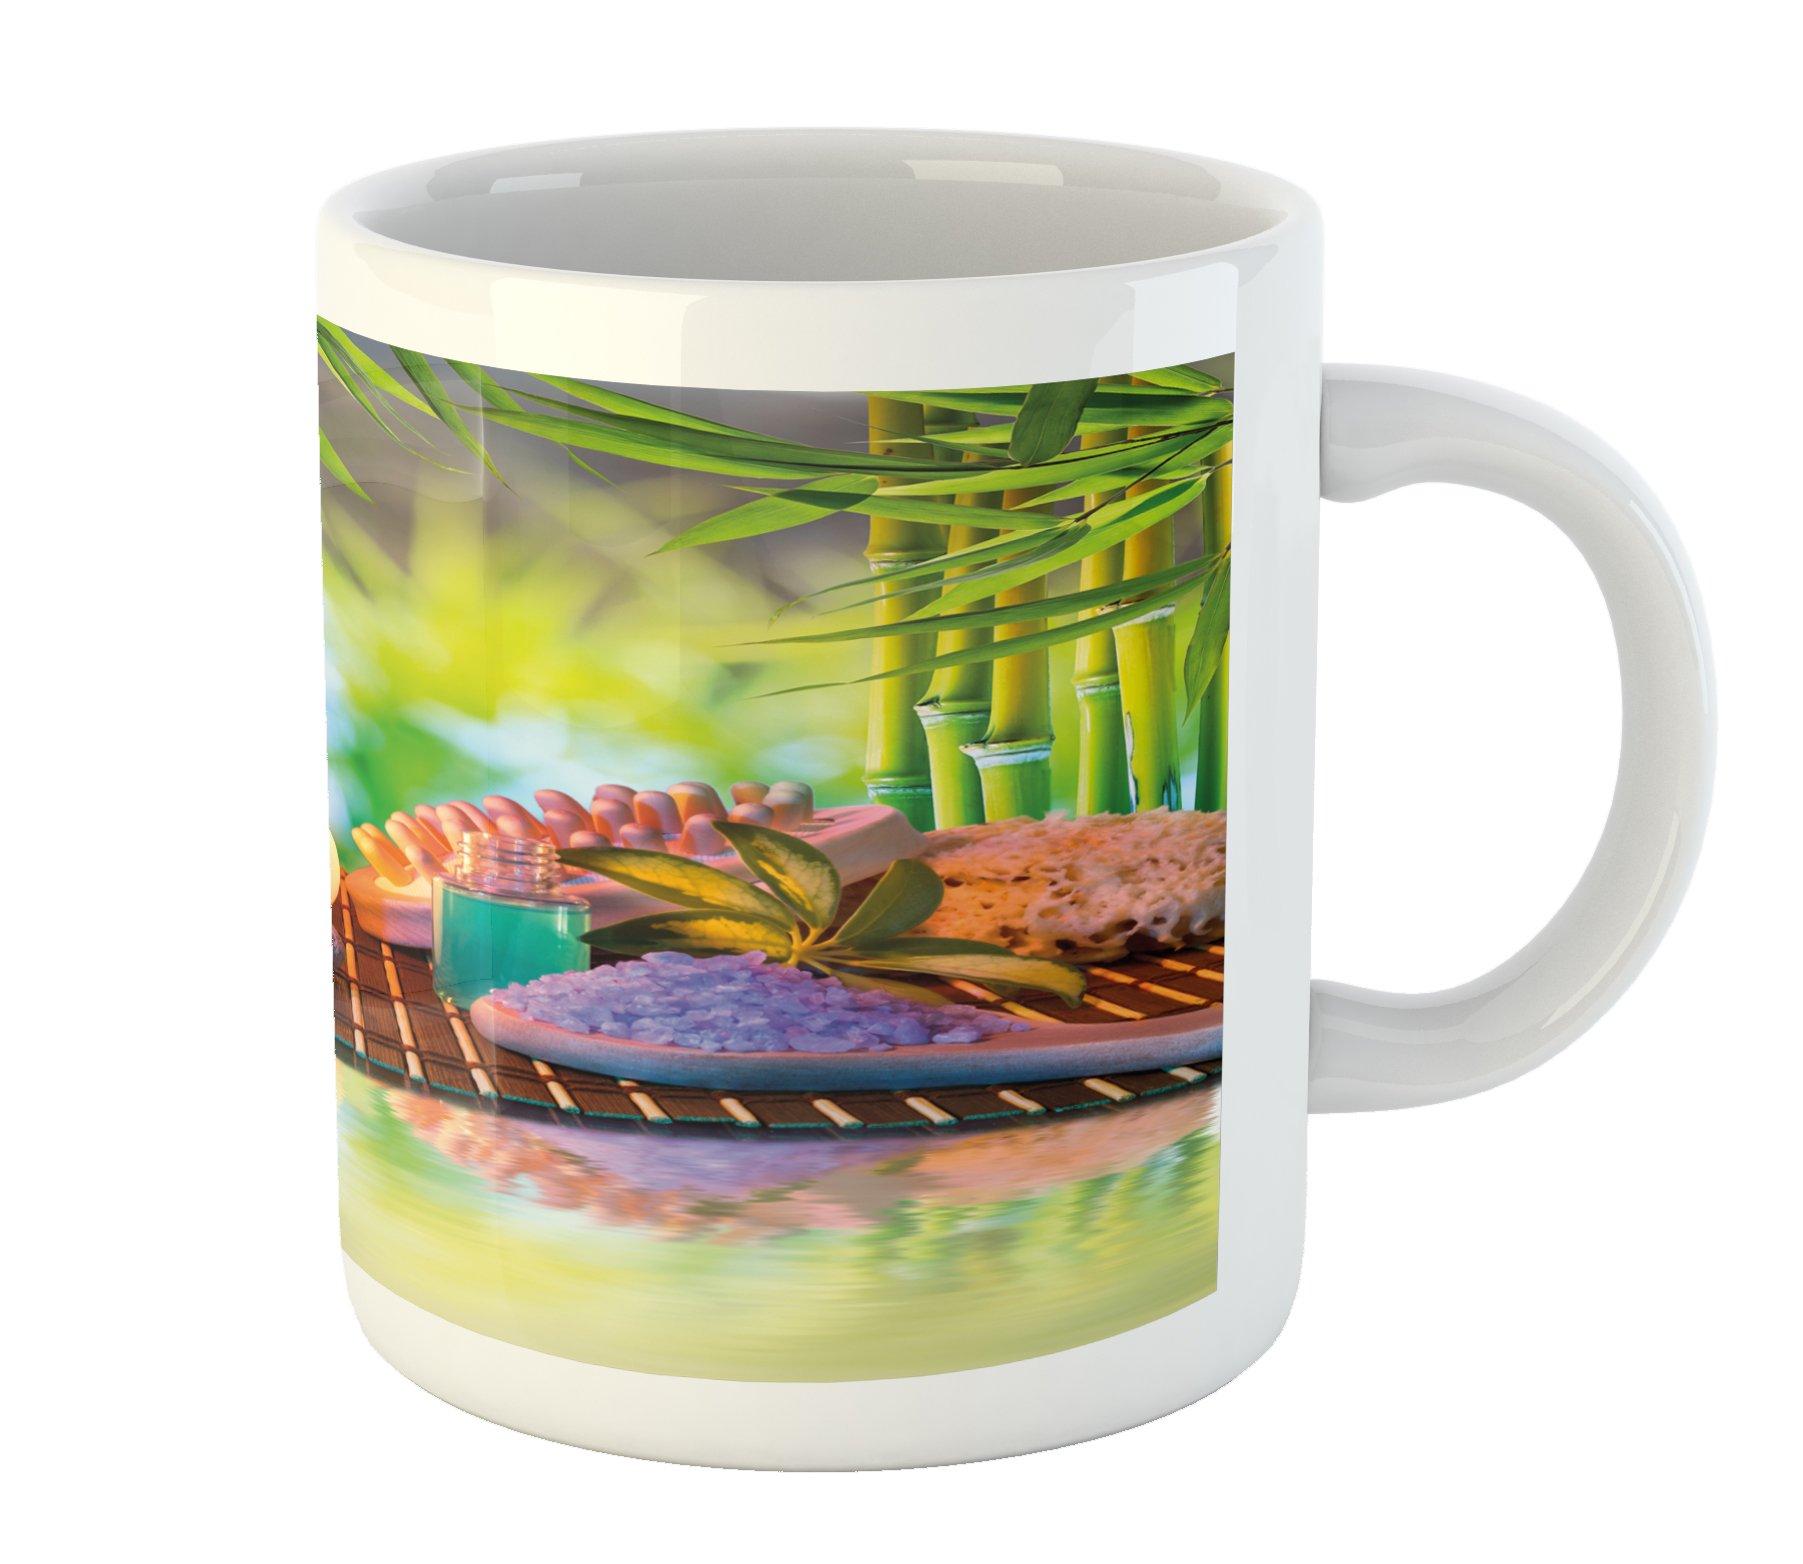 Ambesonne Spa Mug, Stones with Candles Spiritual Eastern Yoga Relaxation Meditation Chakra Bamboos Print, Printed Ceramic Coffee Mug Water Tea Drinks Cup, Multicolor